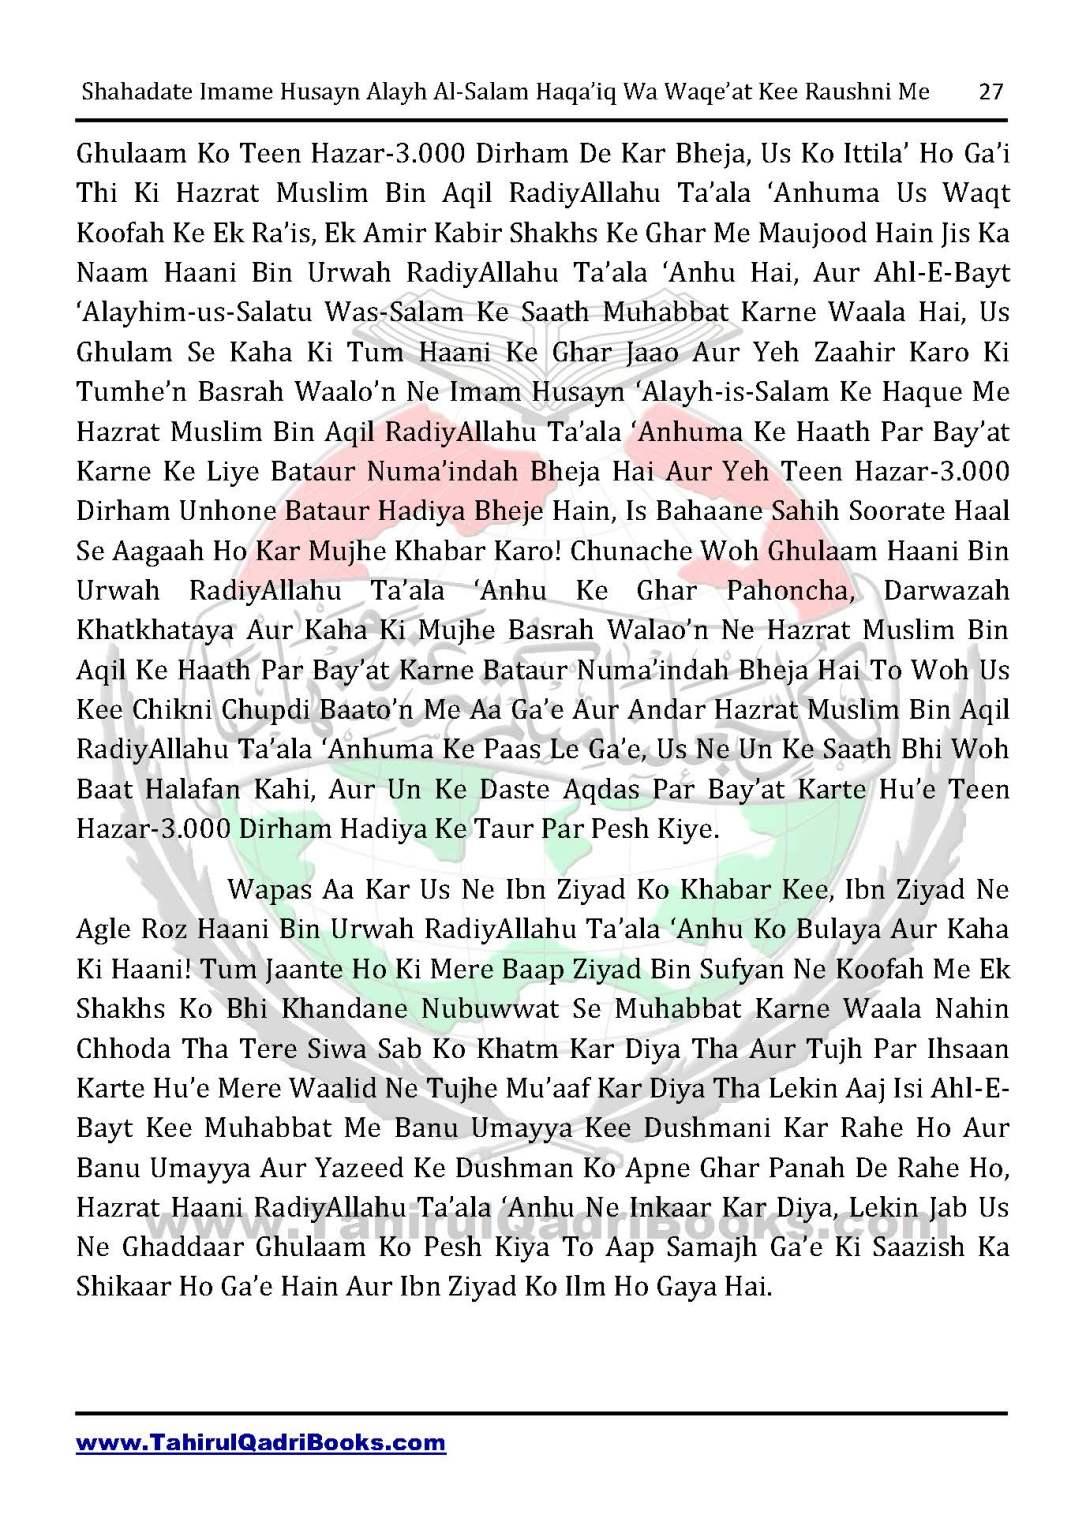 shahadate-imame-husayn-alayh-is-salam-haqaiq-wa-waqe_at-kee-raushni-me-in-roman-urdu-unlocked_Page_27